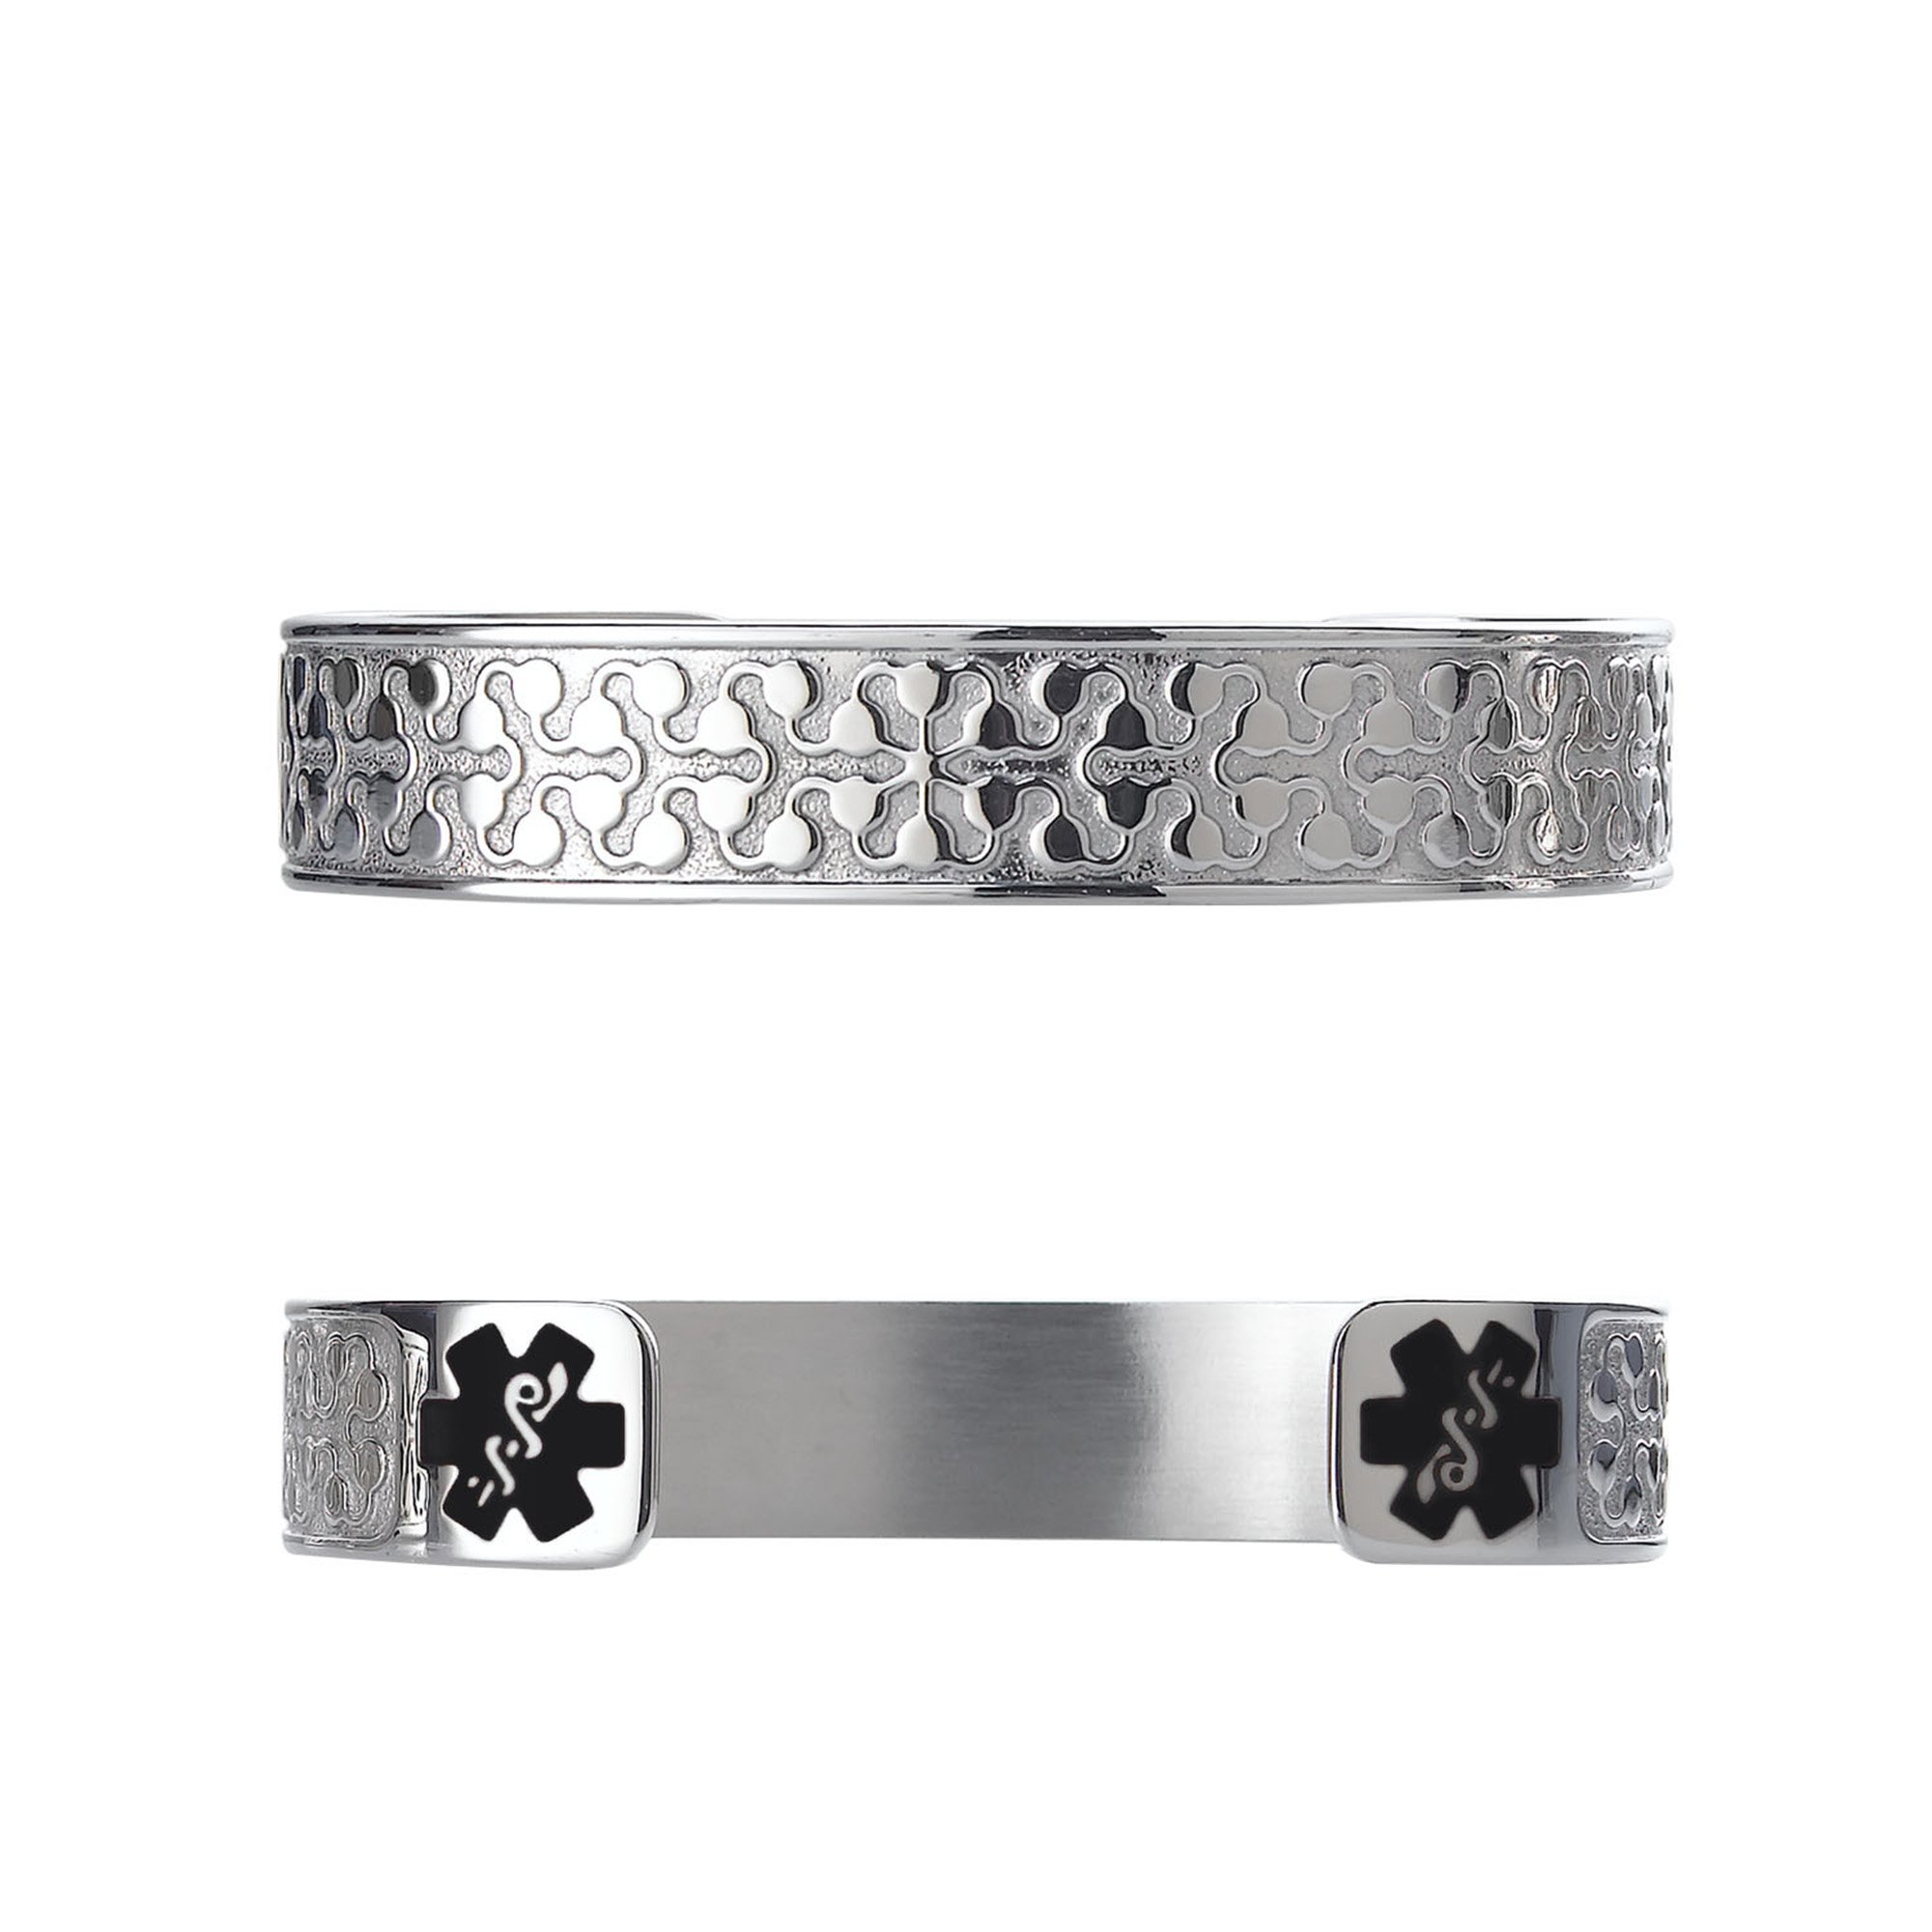 Divoti Custom Engraved Charming Petal 316L Medical Alert Bracelet -6'' Cuff (fits 6.5-8.0'') - Black